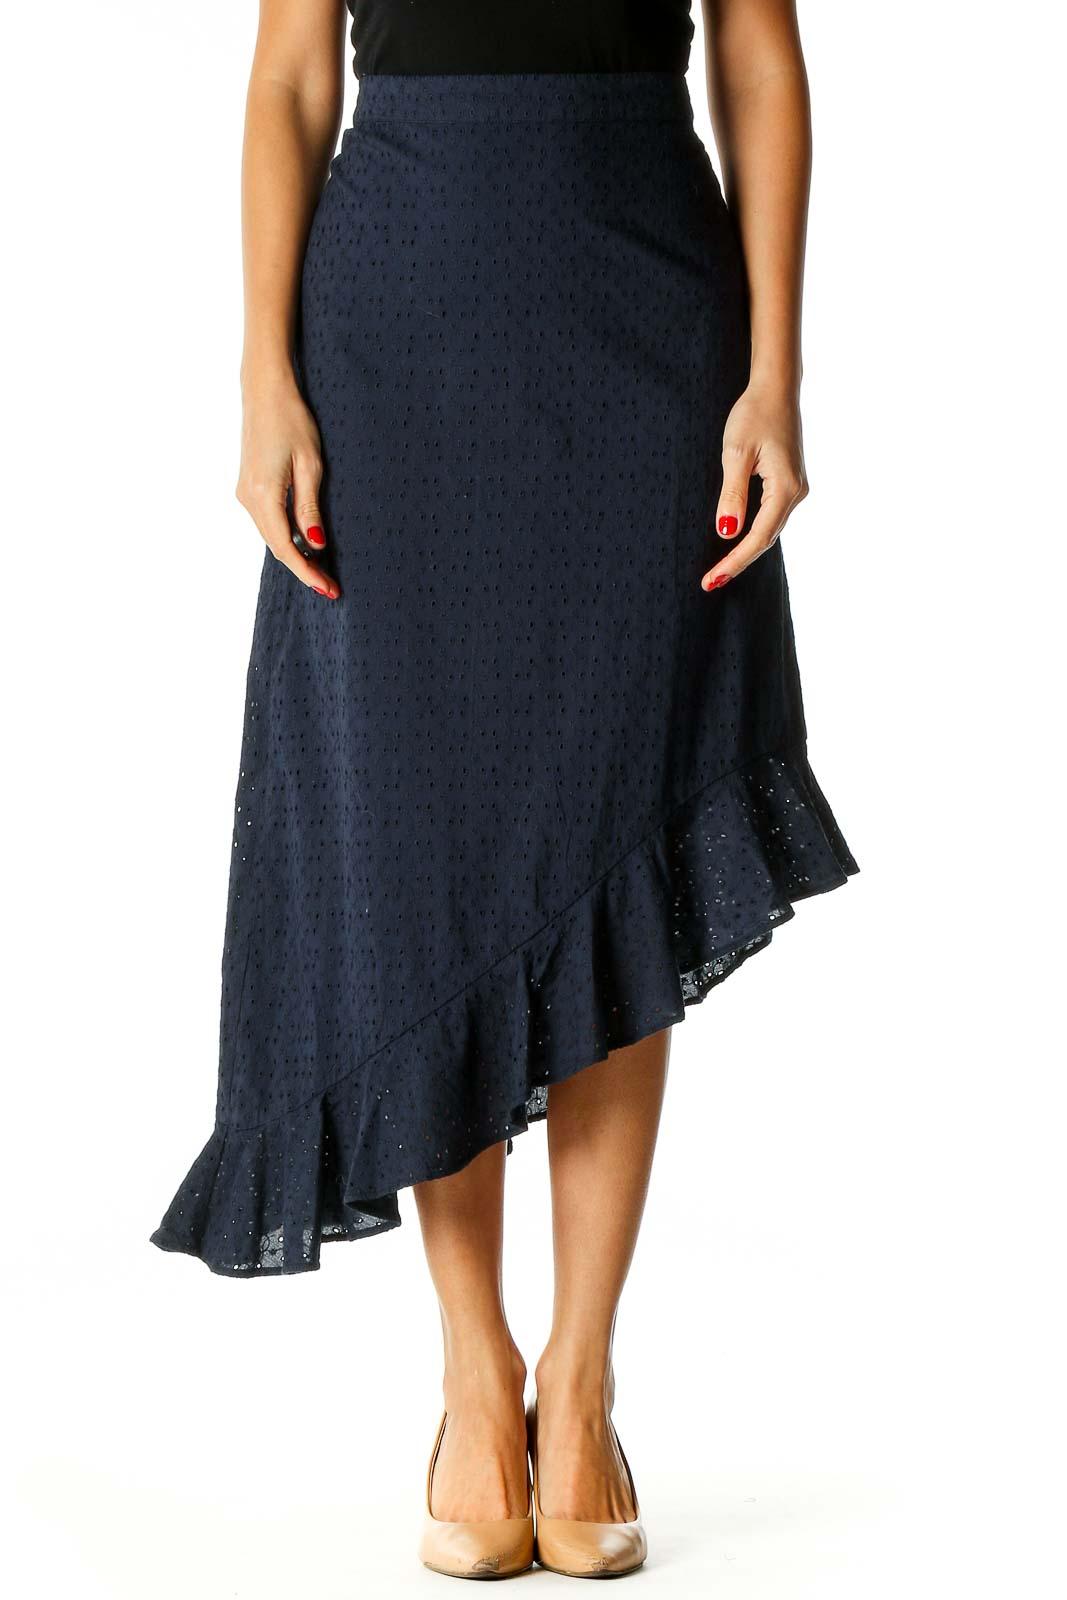 Blue Brunch A-Line Skirt Front